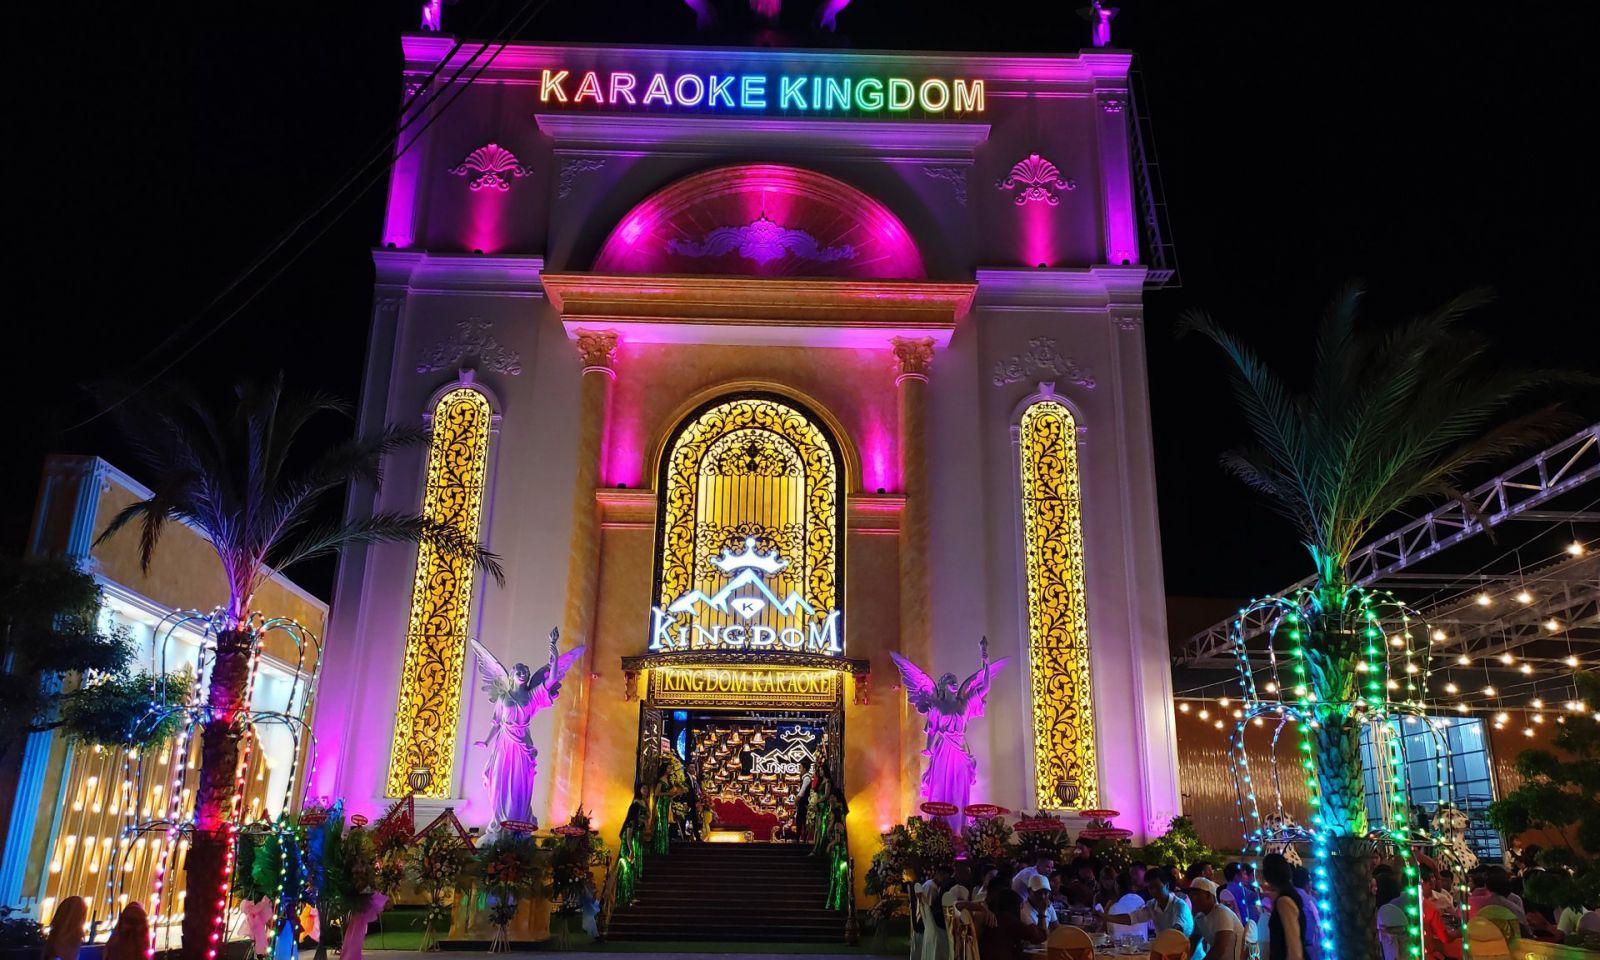 KARAOKE KINGDOM DAKNONG